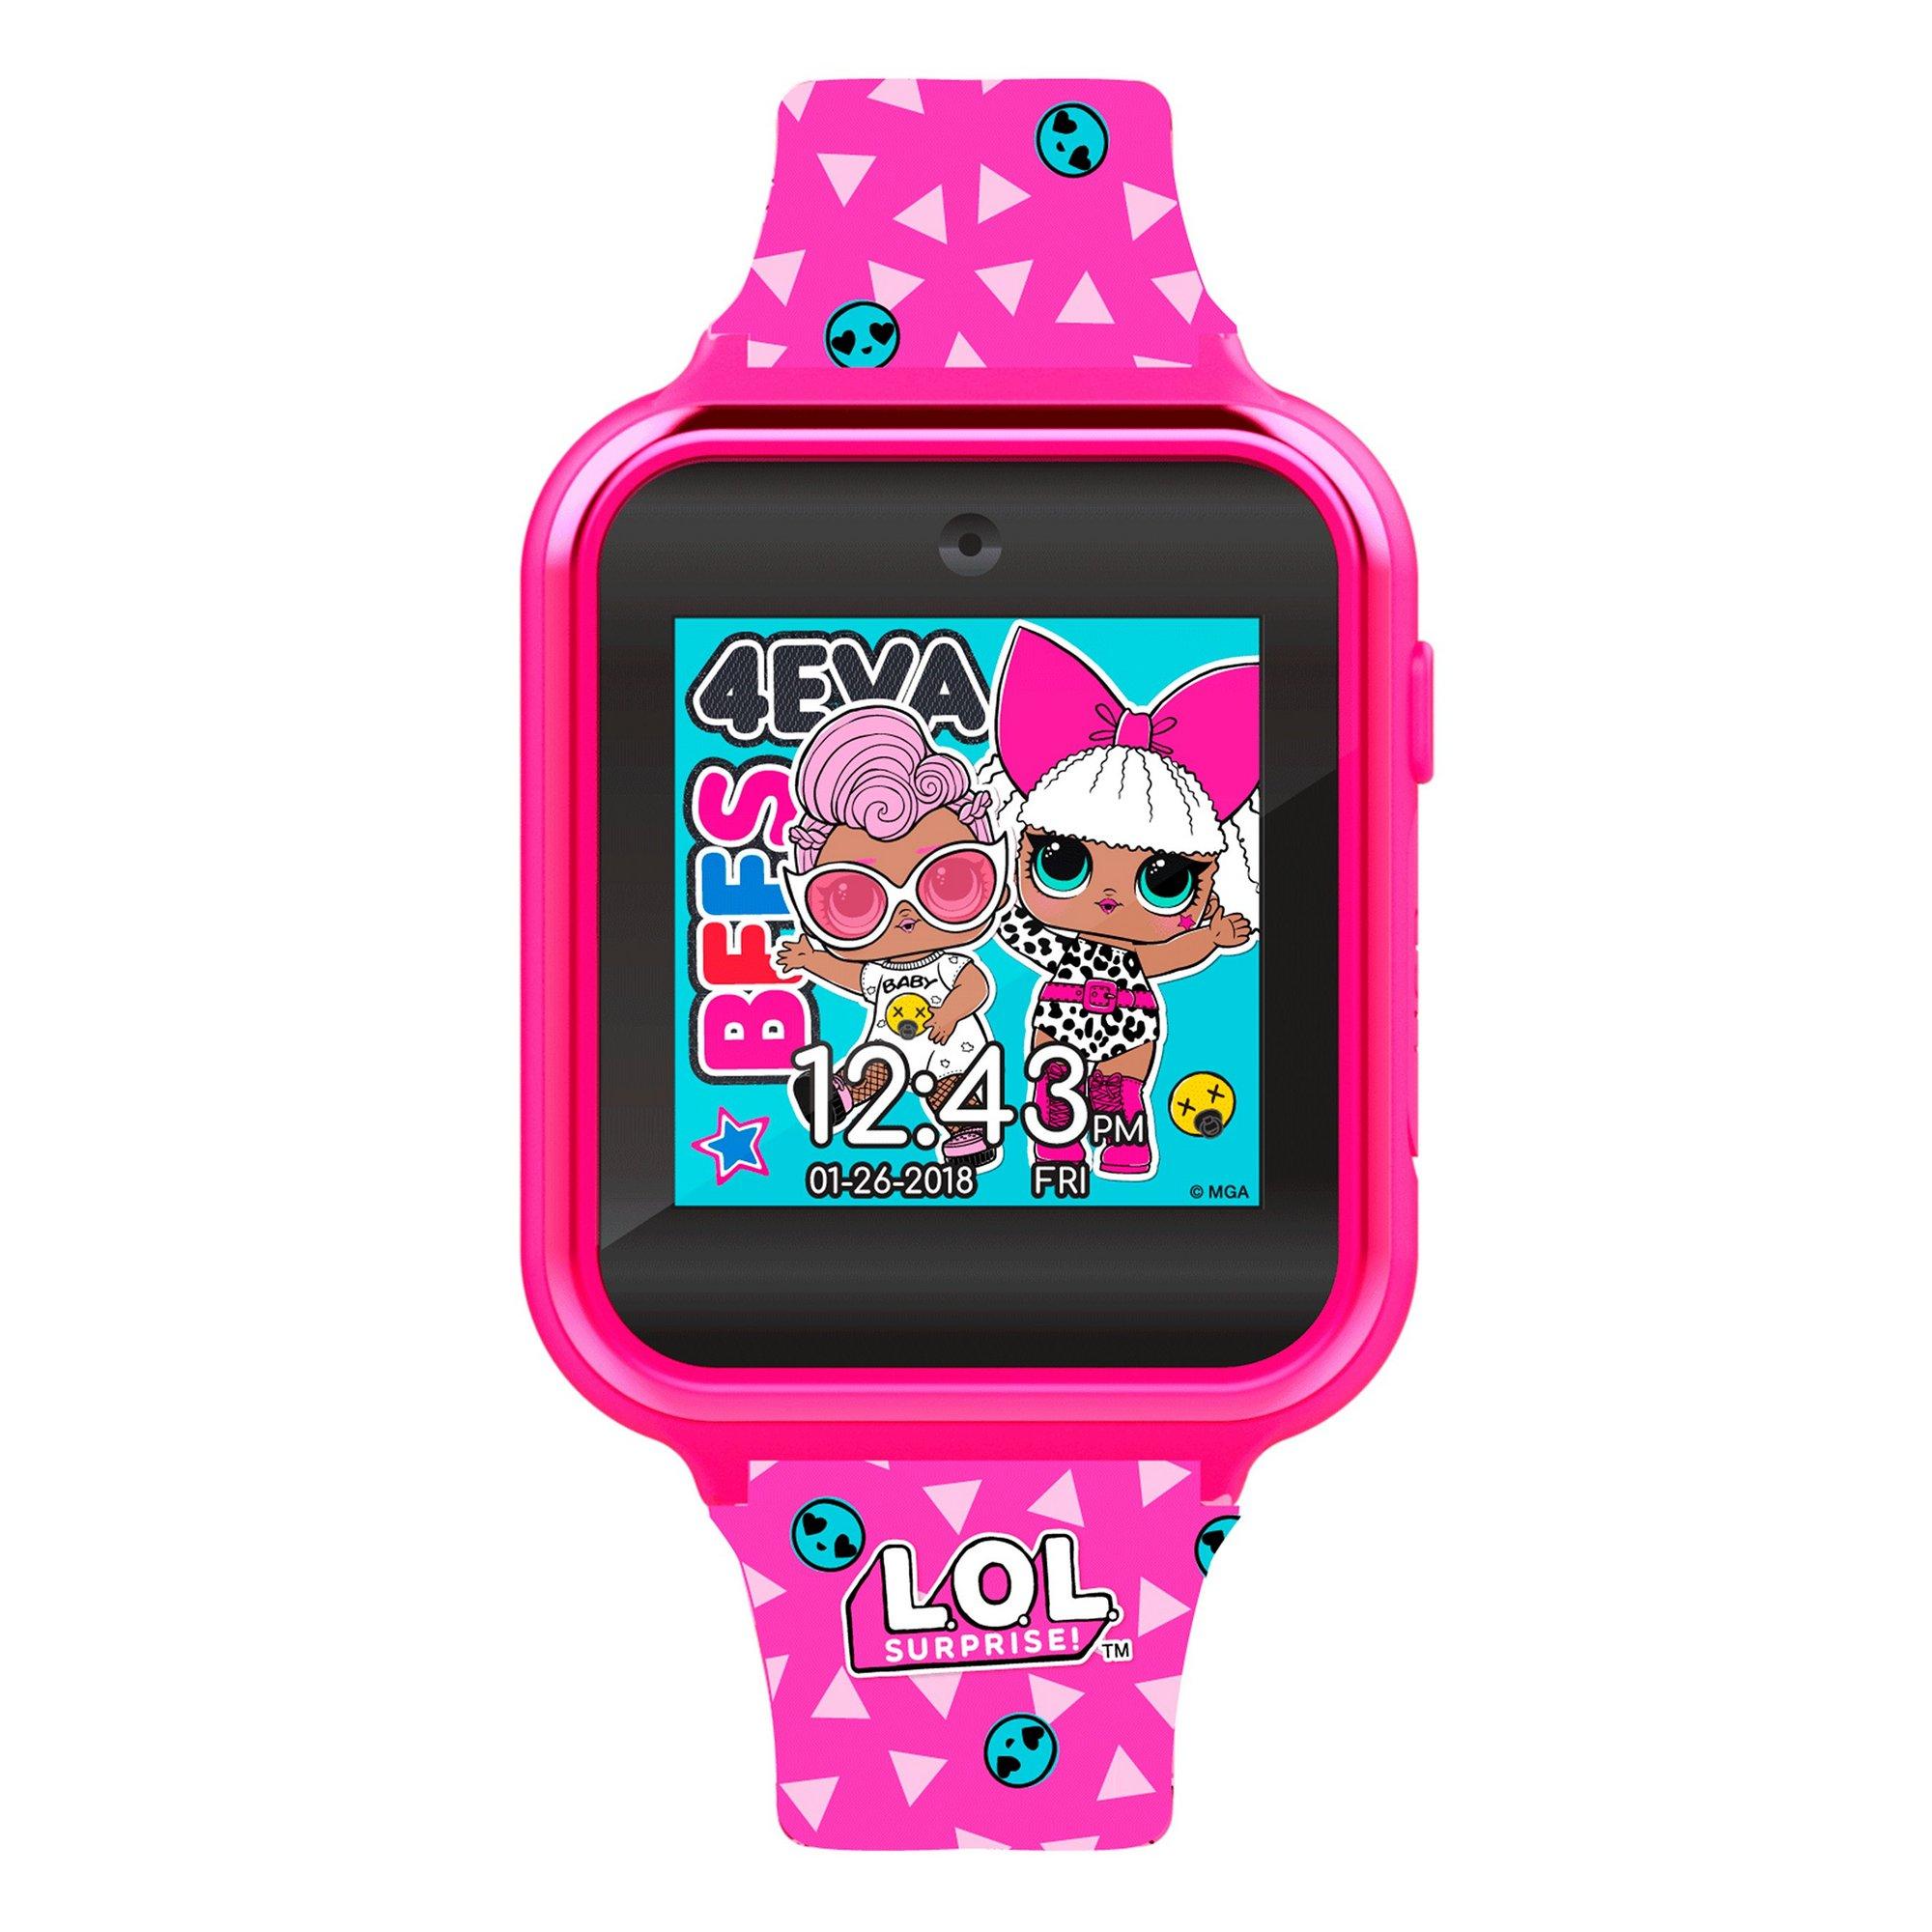 Image of L.O.L Surprise! Smart Watch